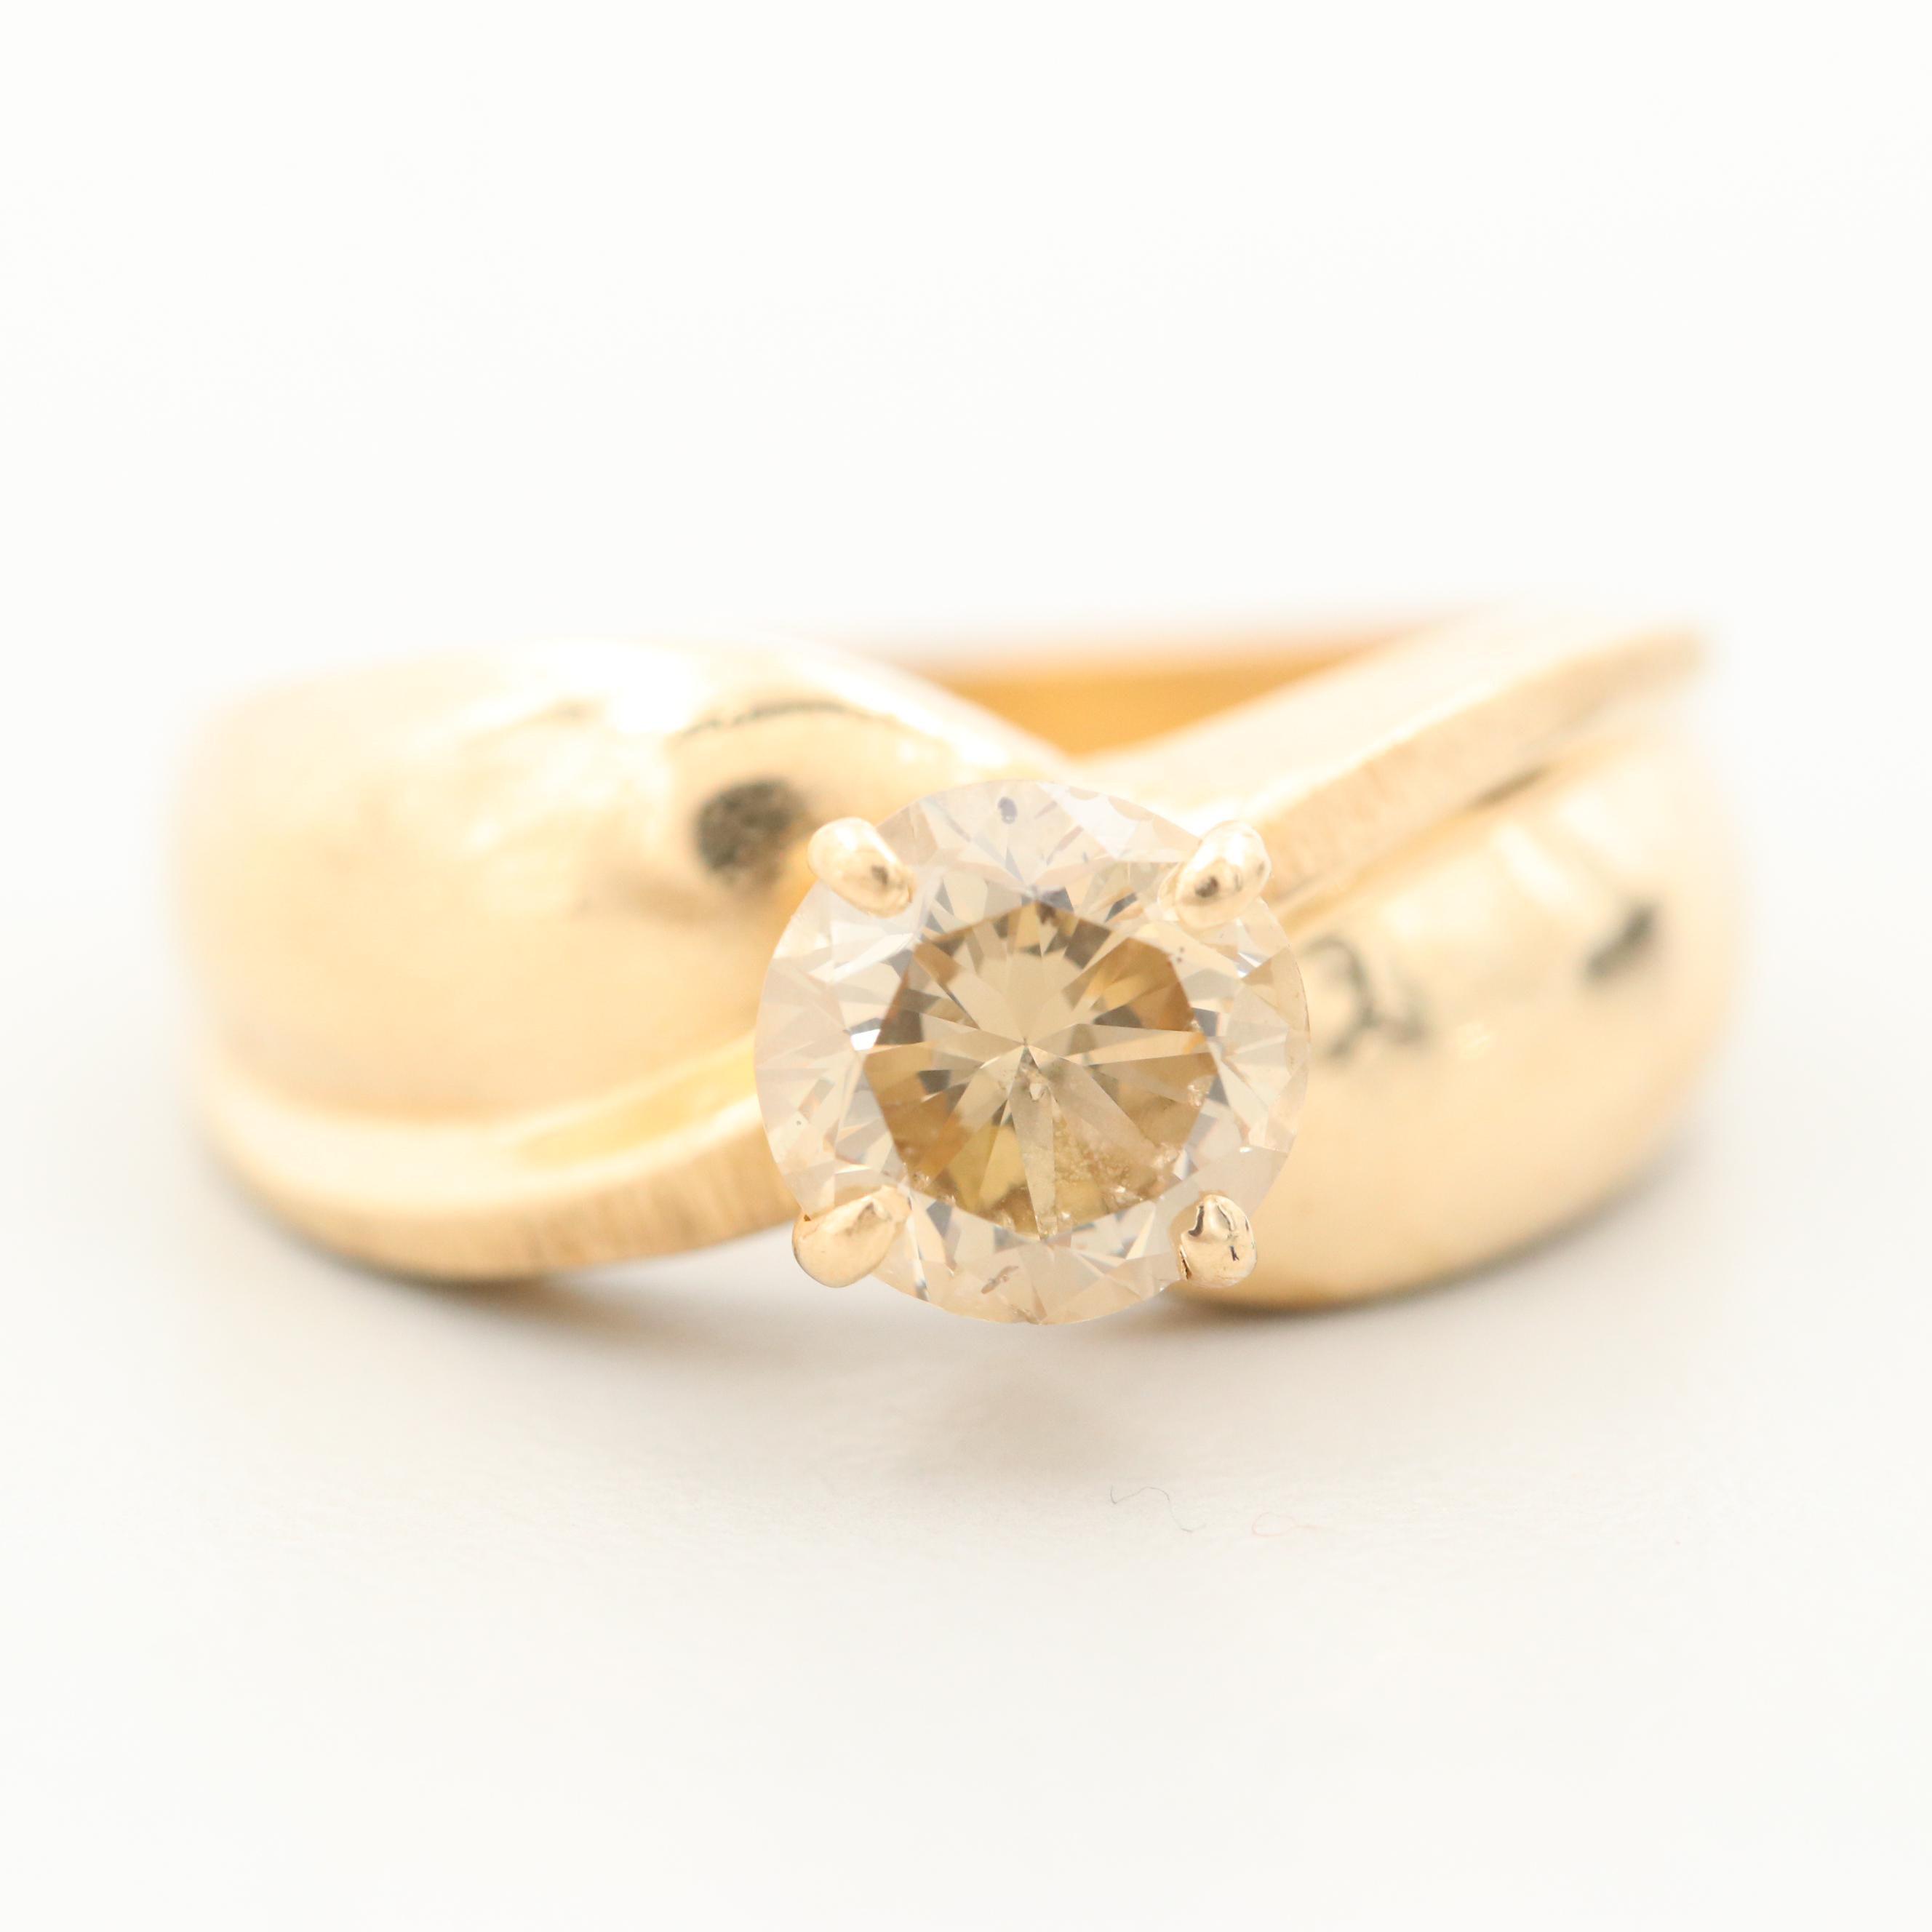 14K Yellow Gold 1.22 CT Diamond Ring